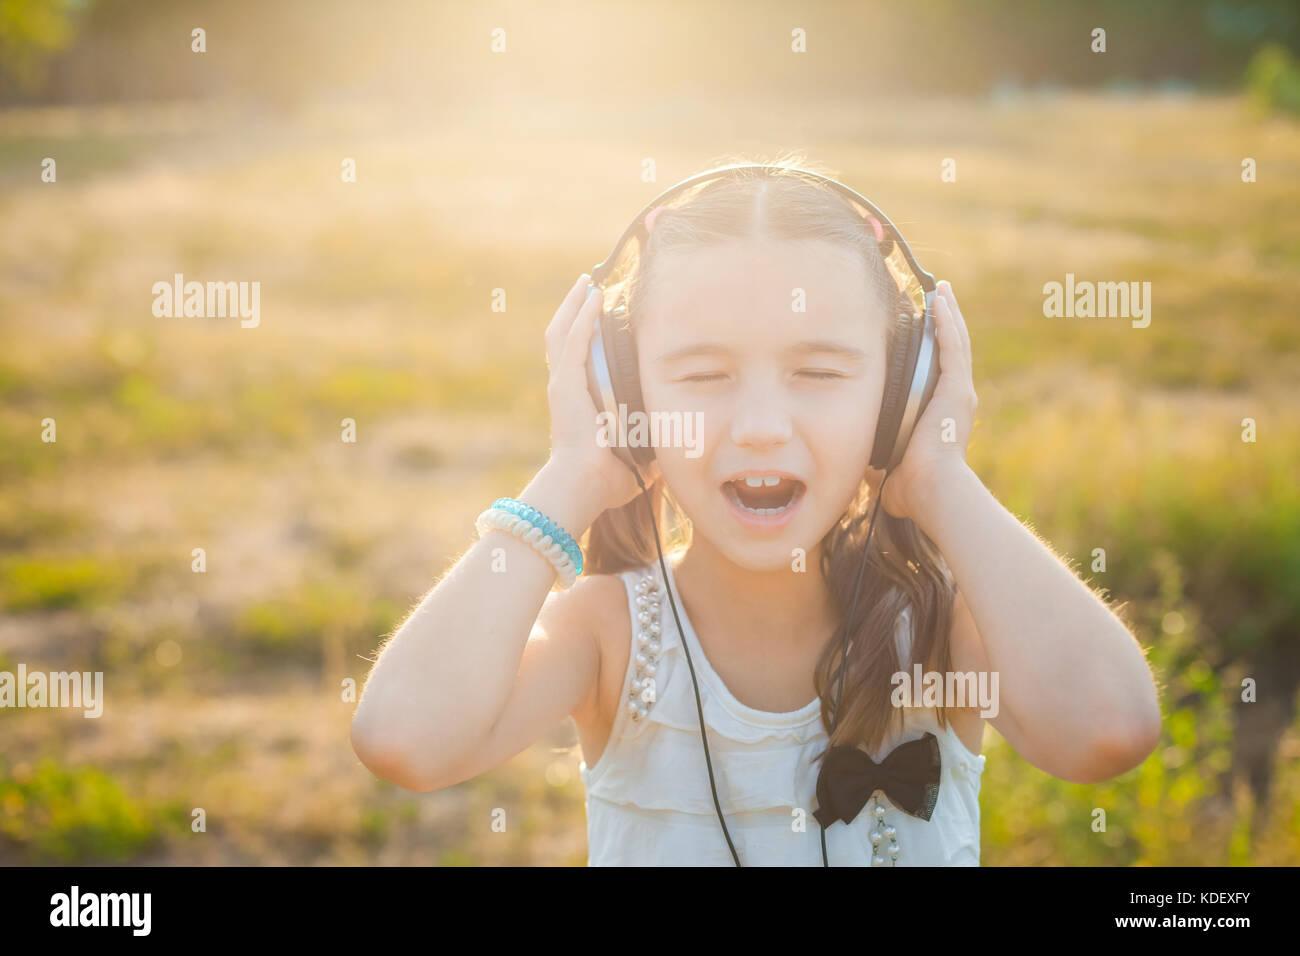 Kleine Mädchen Musik hören mit Kopfhörern Stockbild